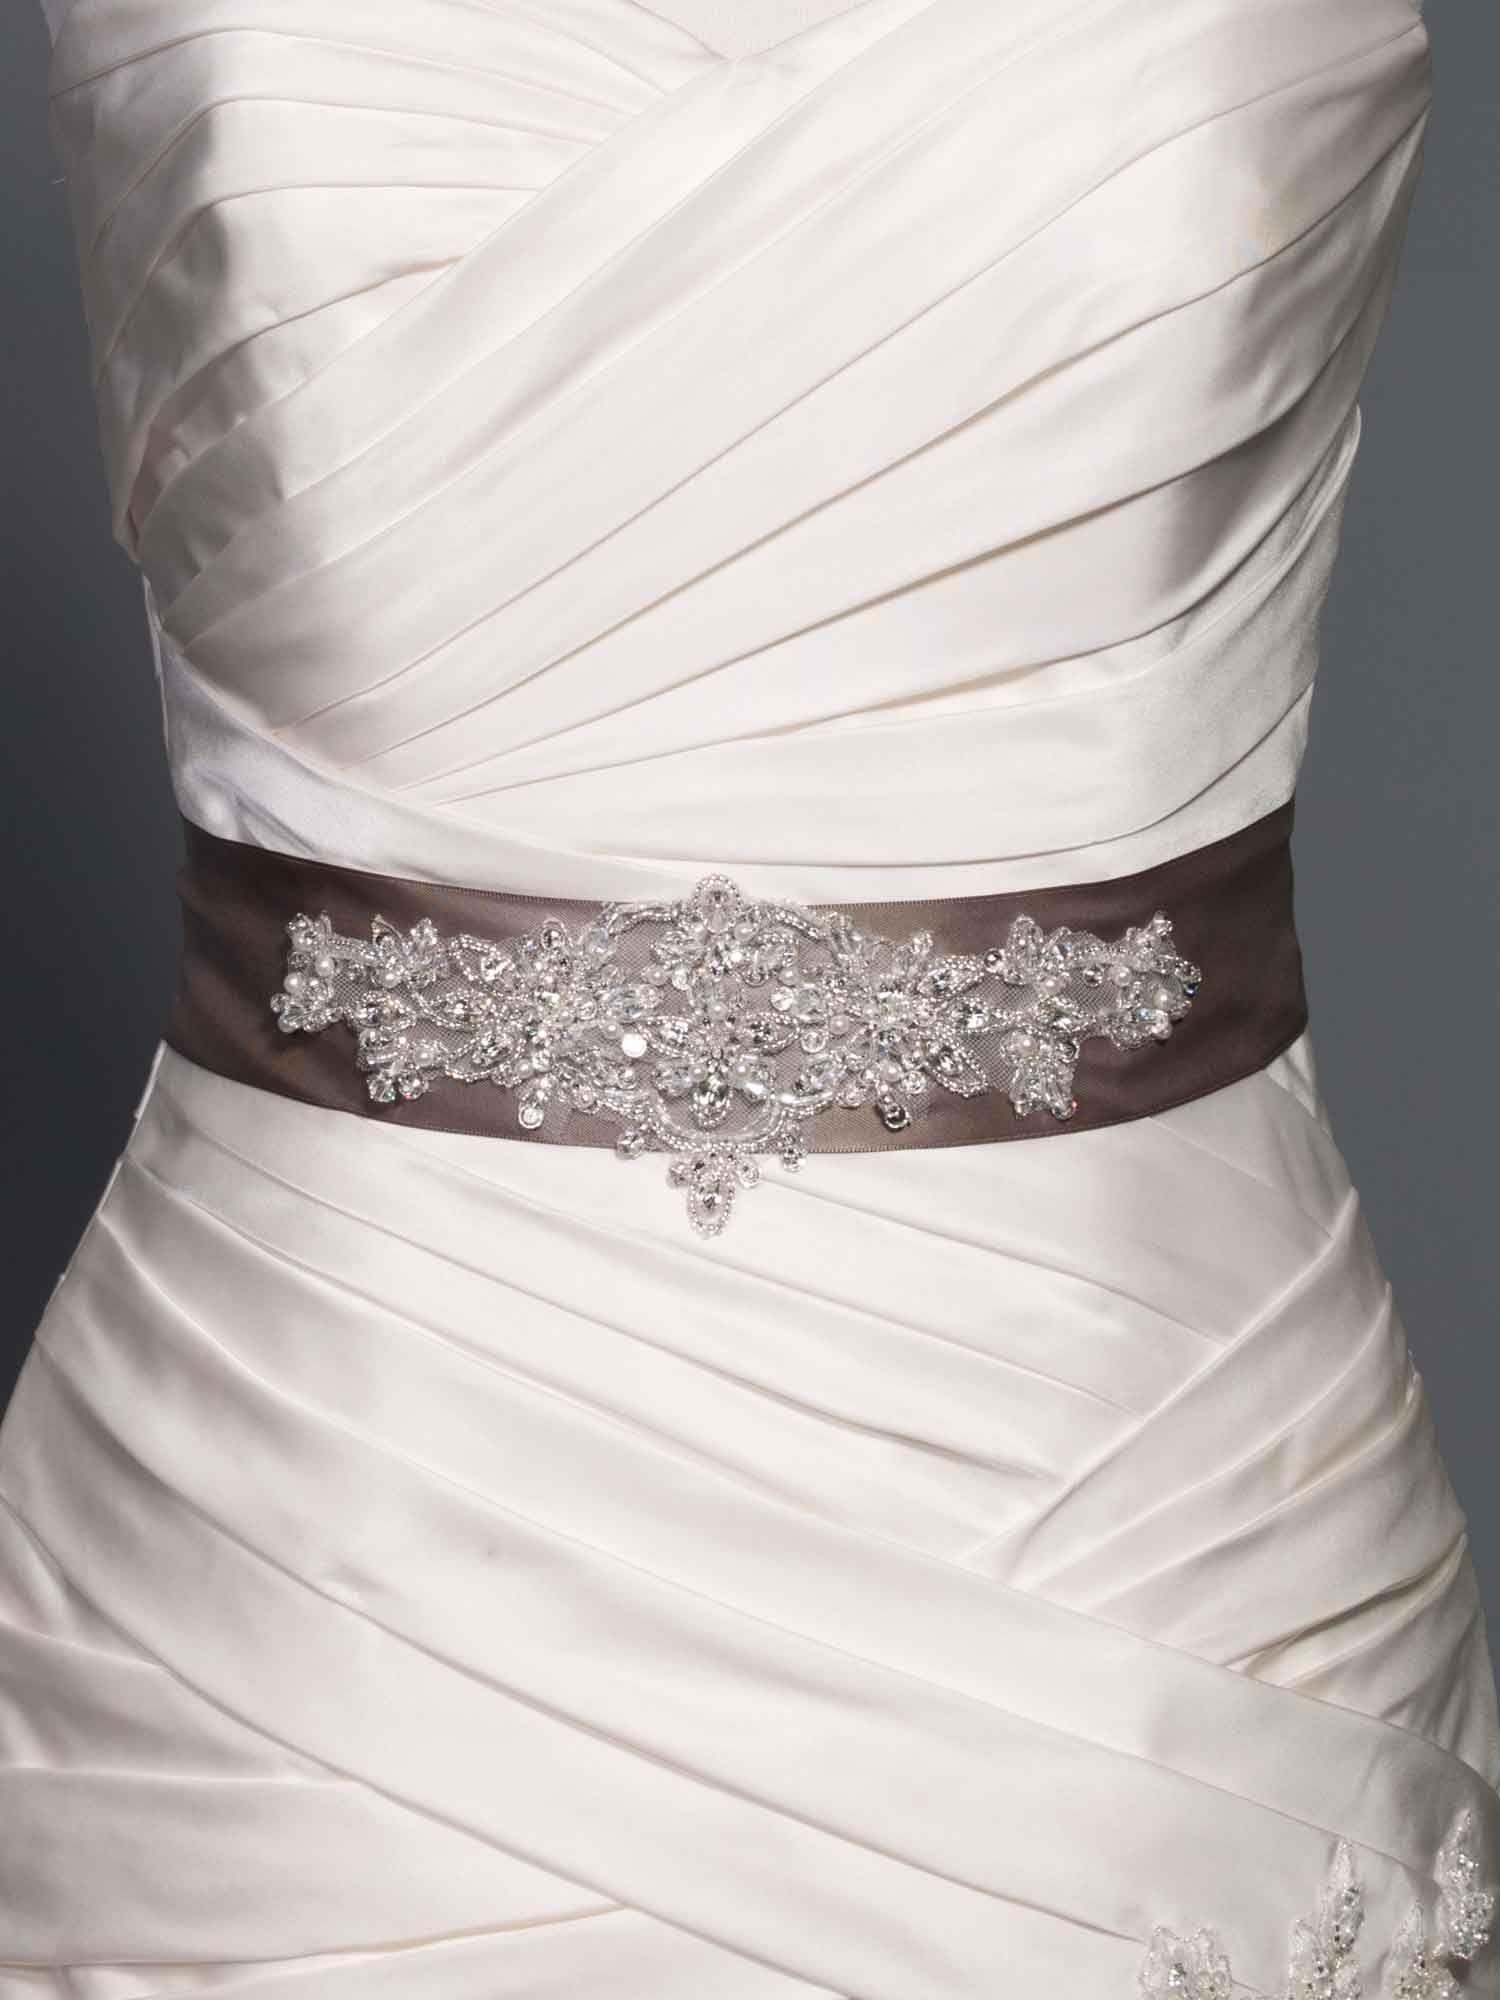 Sparkle rhinestone belt adds to a simple elegant wedding for Sparkly wedding dress belt